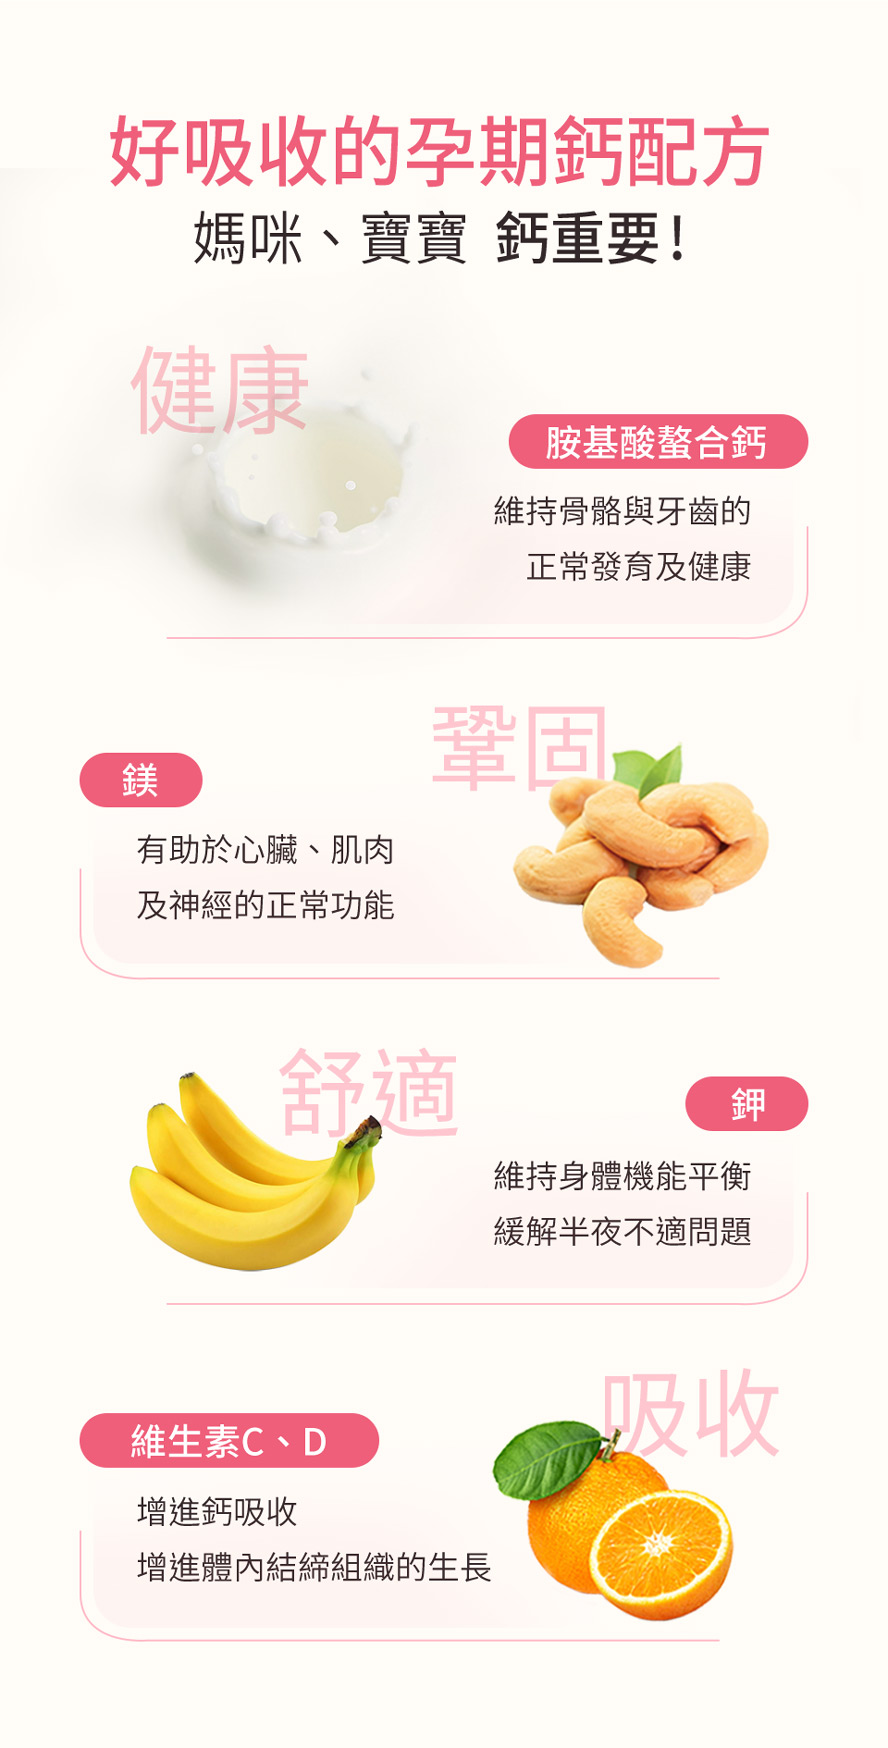 BHK孕媽咪螯合鈣,嚴選最高吸收率的胺基酸螯合鈣,添加維他命D、維他命C增進鈣質吸收,頂級配方完勝市售。